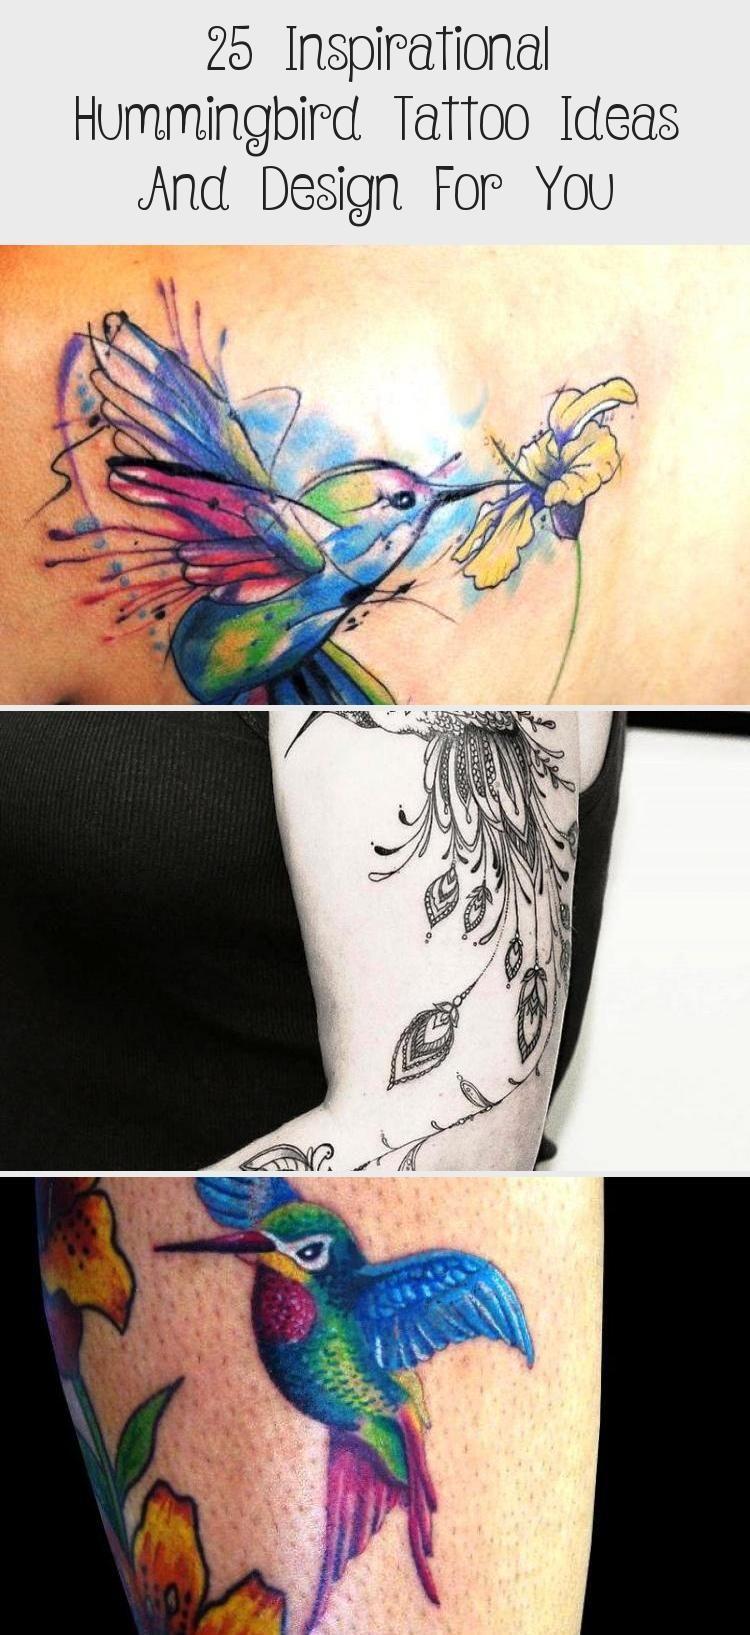 Design Hummingbird ideas Inspirational Tattoo 25